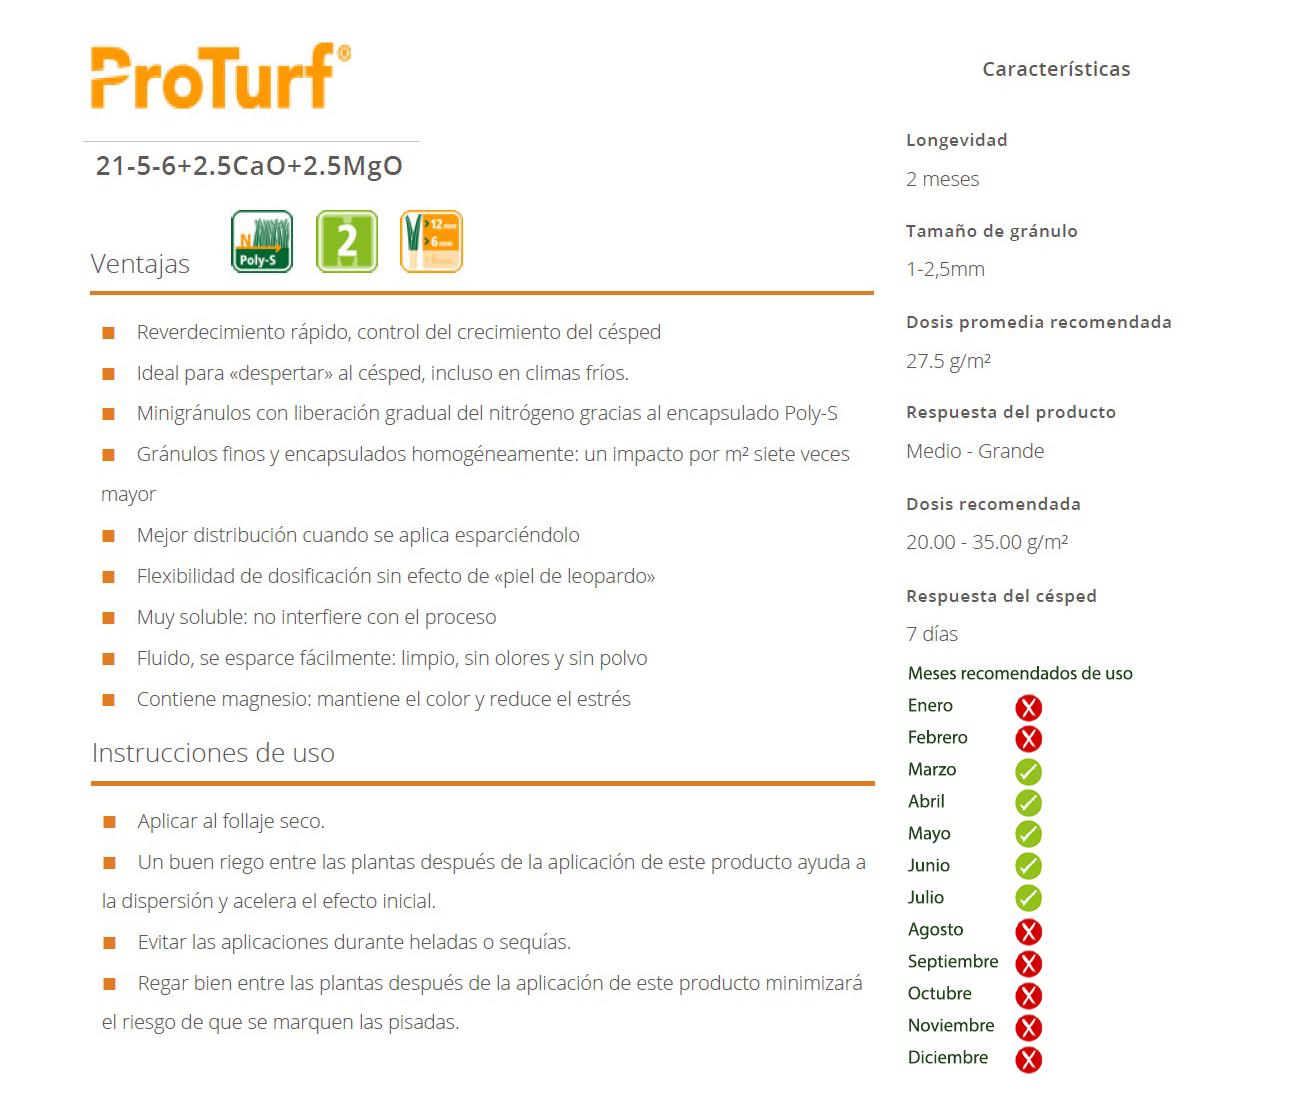 Ficha Tecnica de abono proturf de tecnicesped